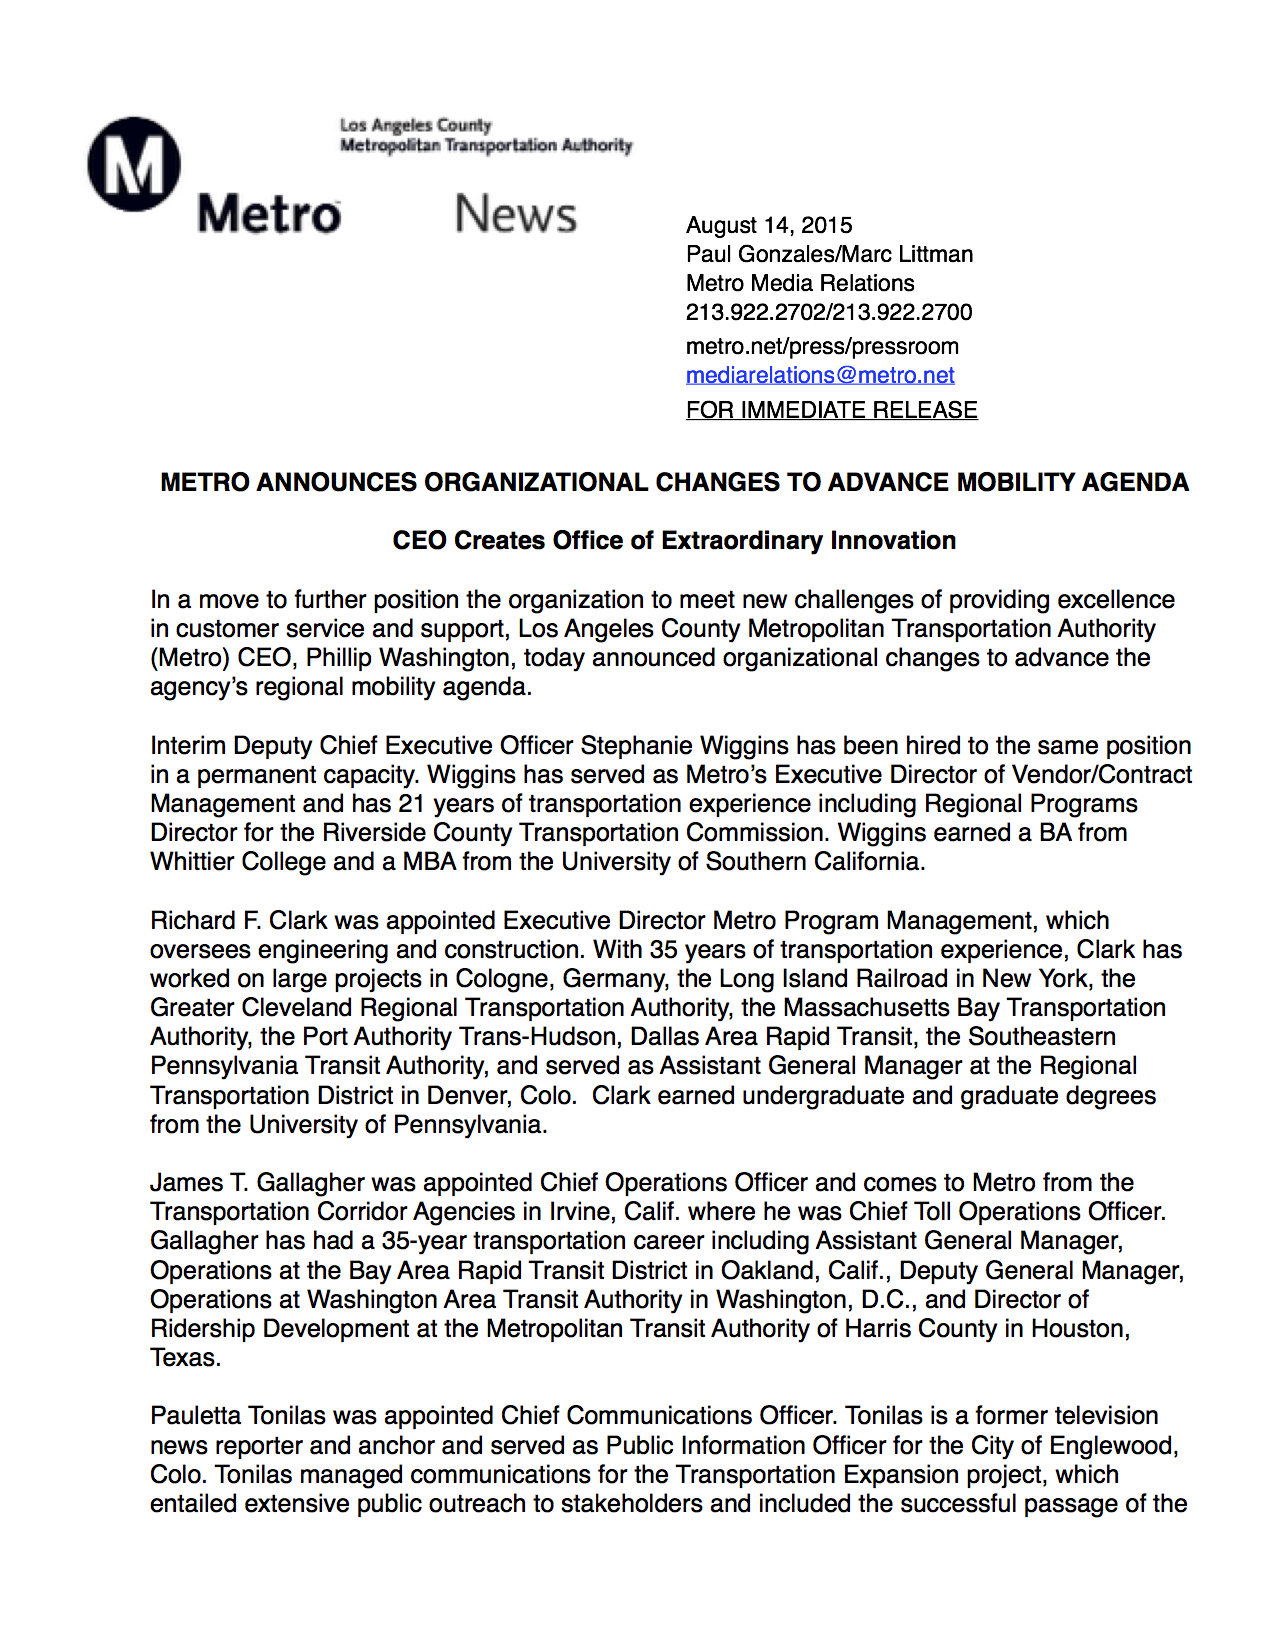 Metro ReorganizationRev2